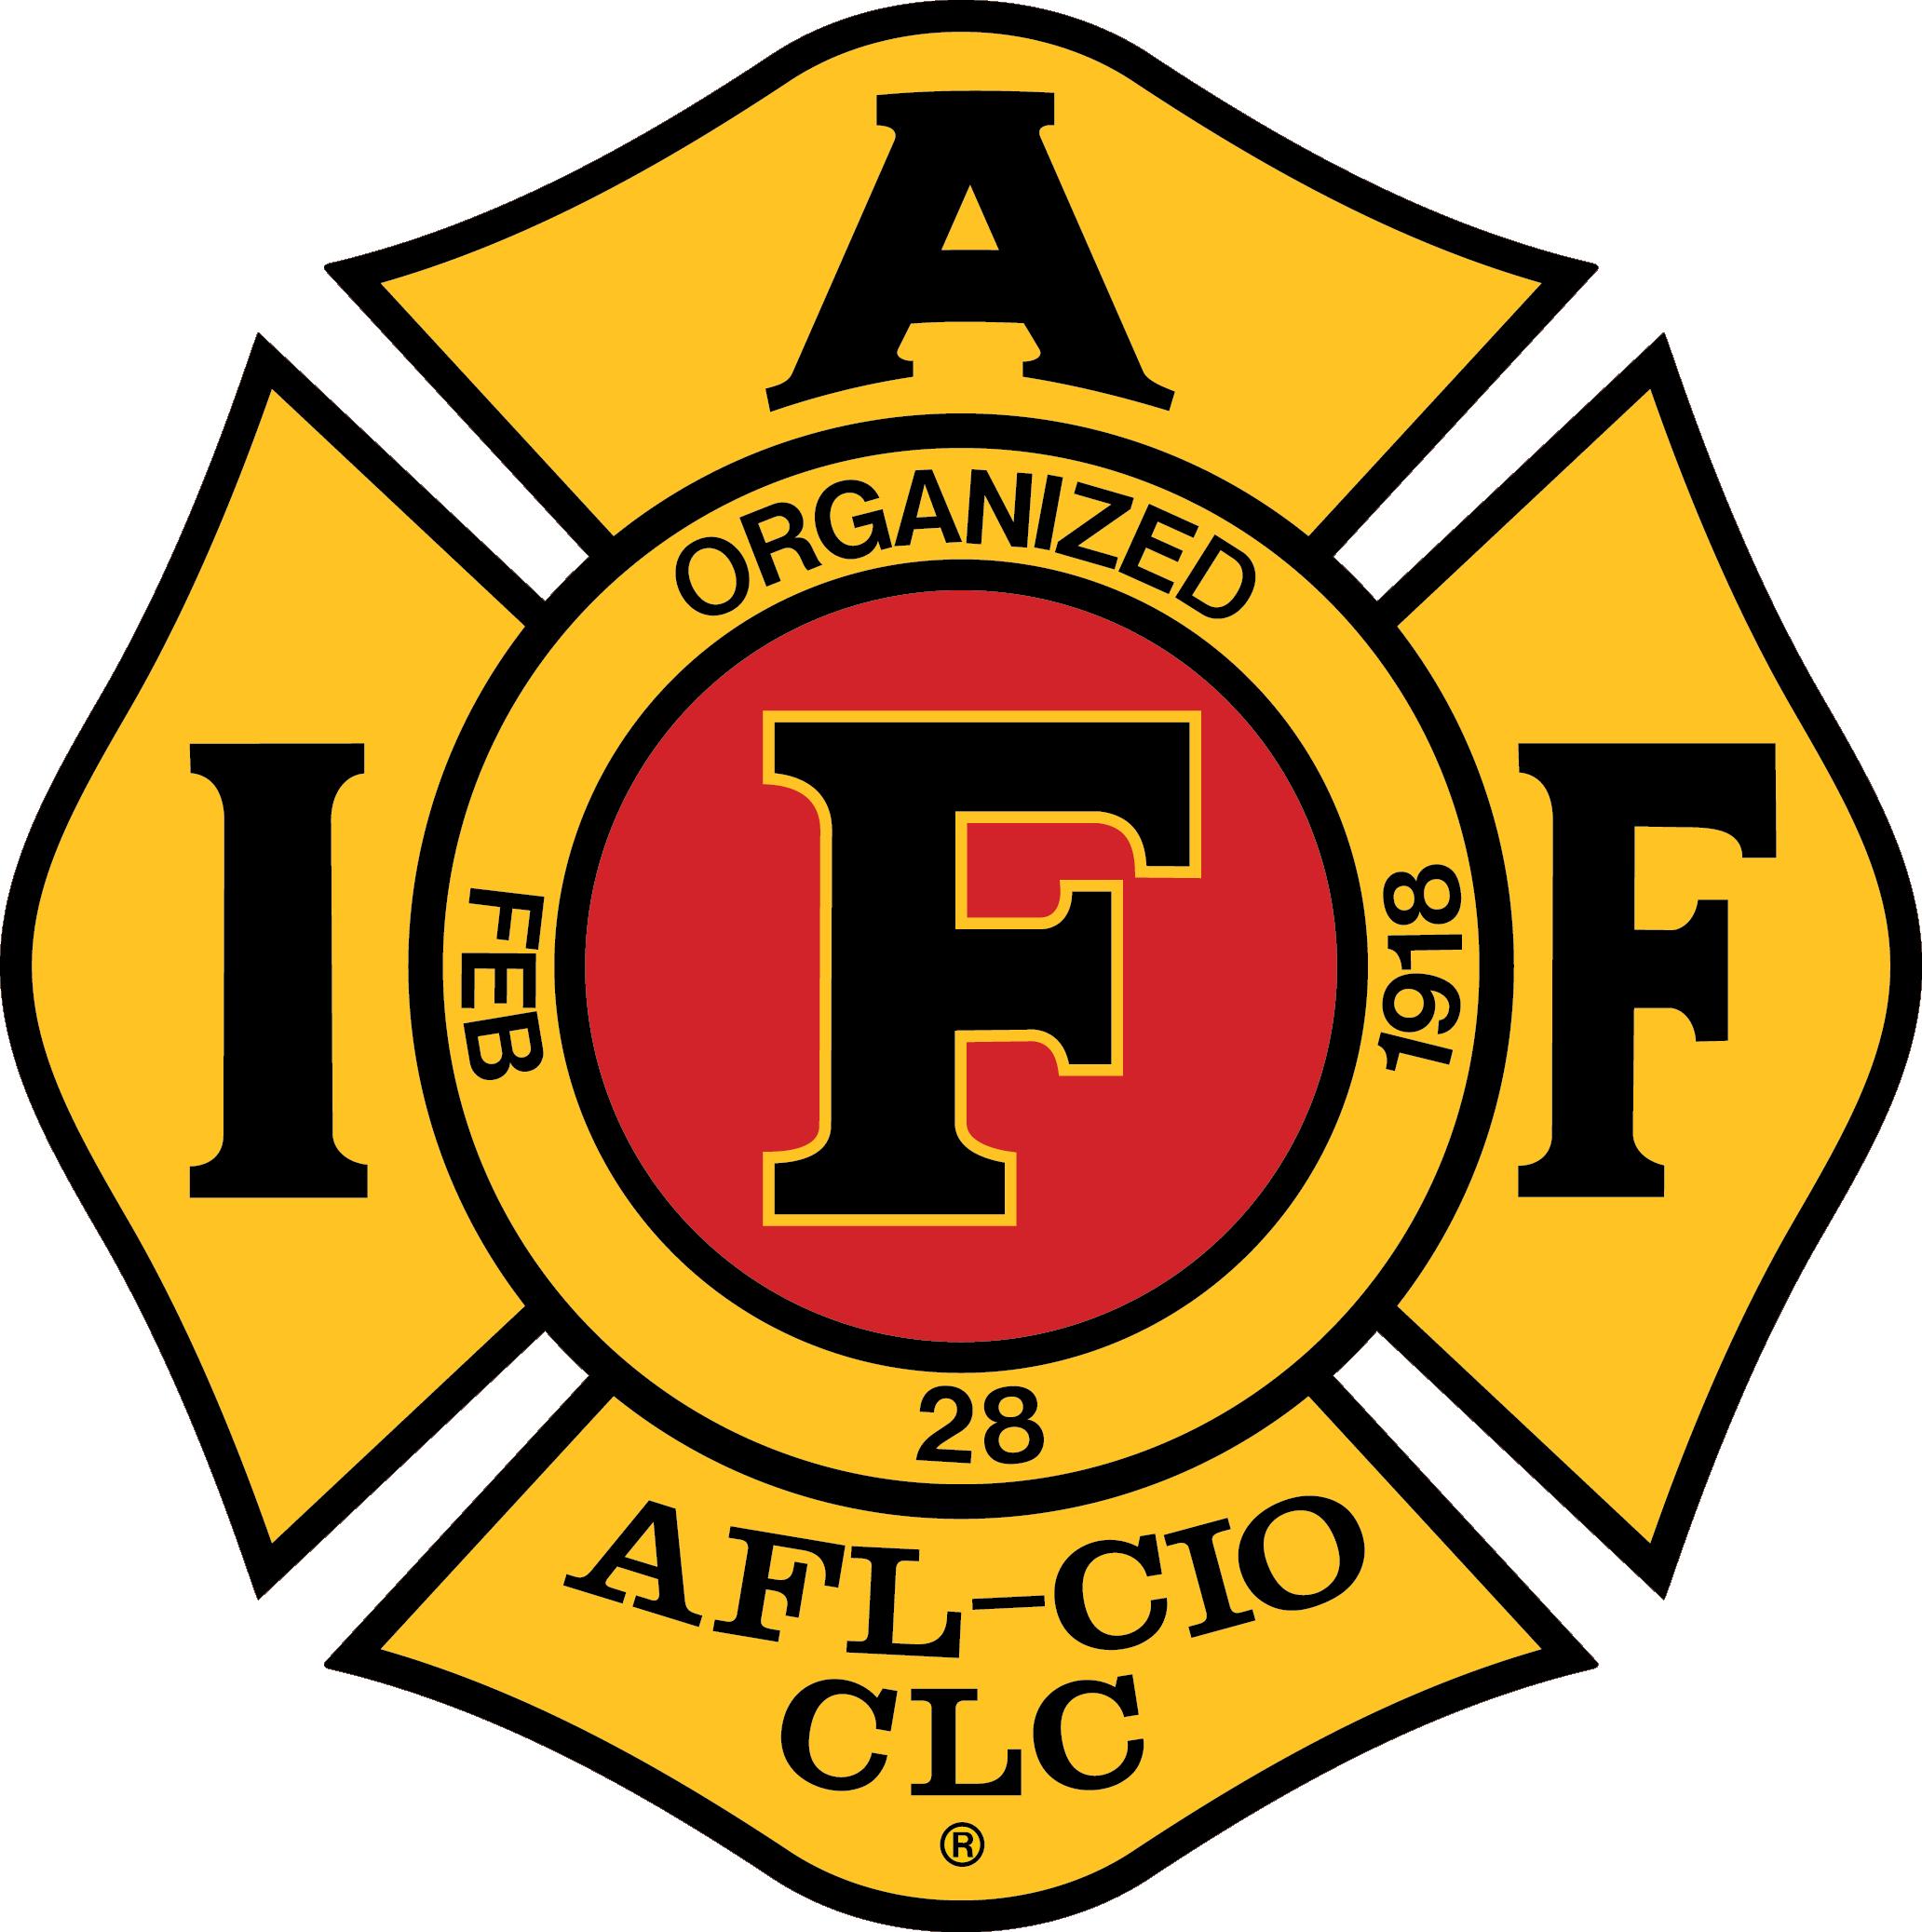 IAFF History: February 28, 1918 | Cuyahoga Falls Fire